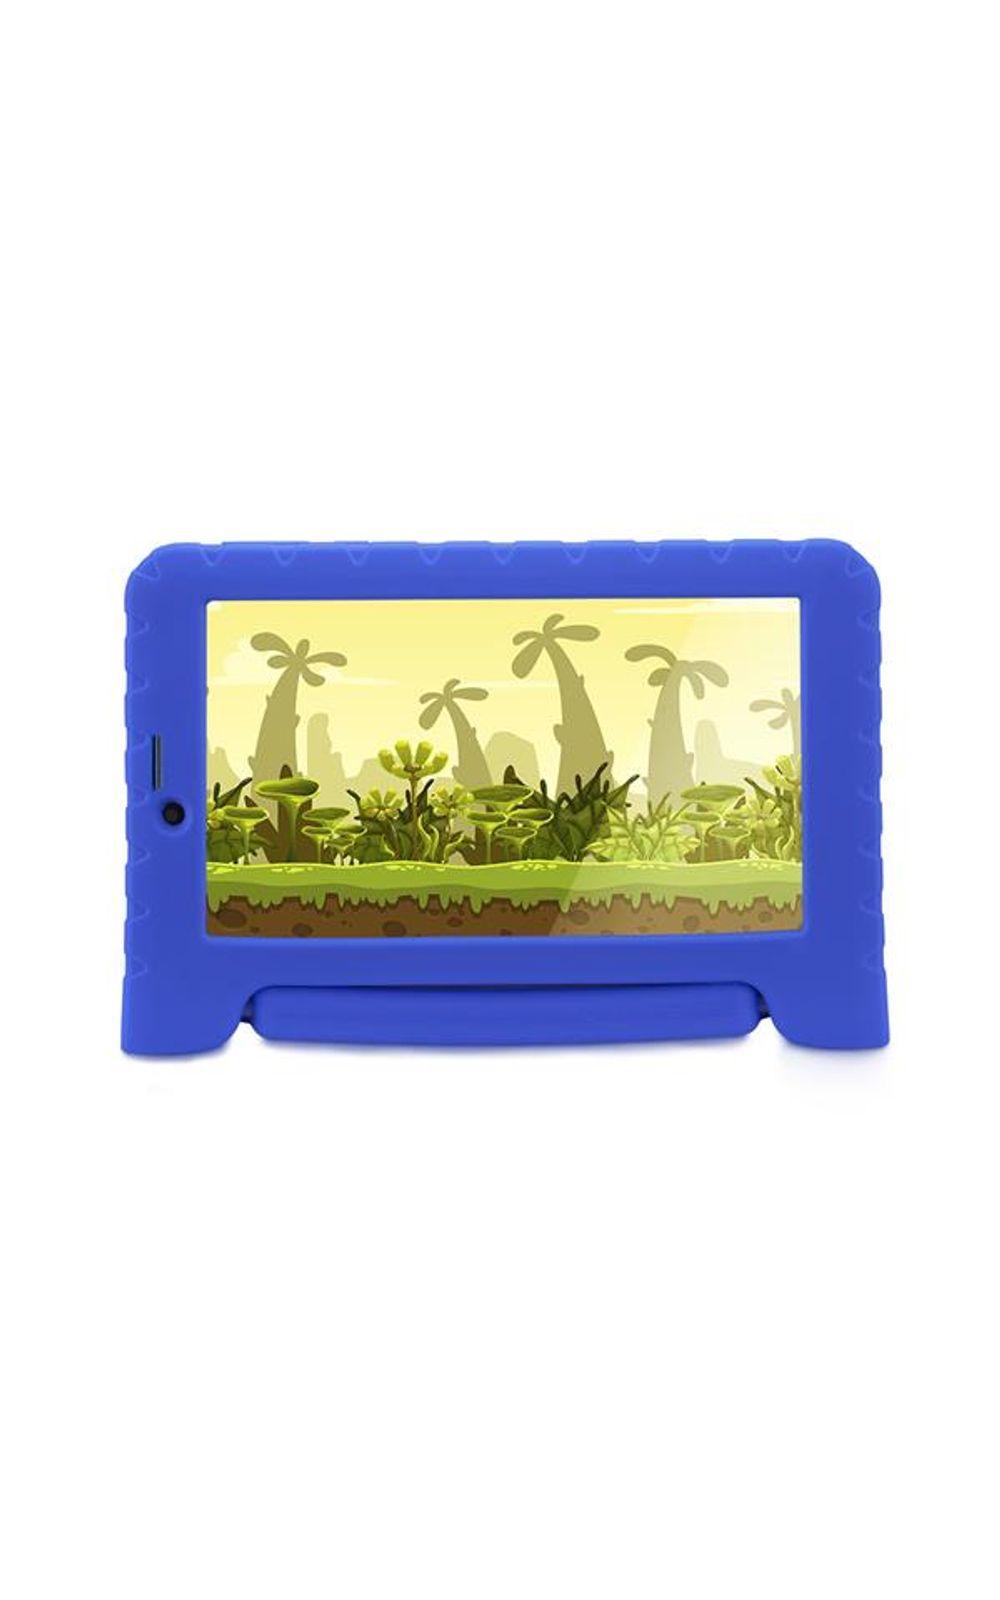 Foto 1 - Tablet Multilaser Kid Pad 3G Plus Azul 1Gb Android 8.1 Oreo Wifi Memória 8Gb Quad Core - NB291